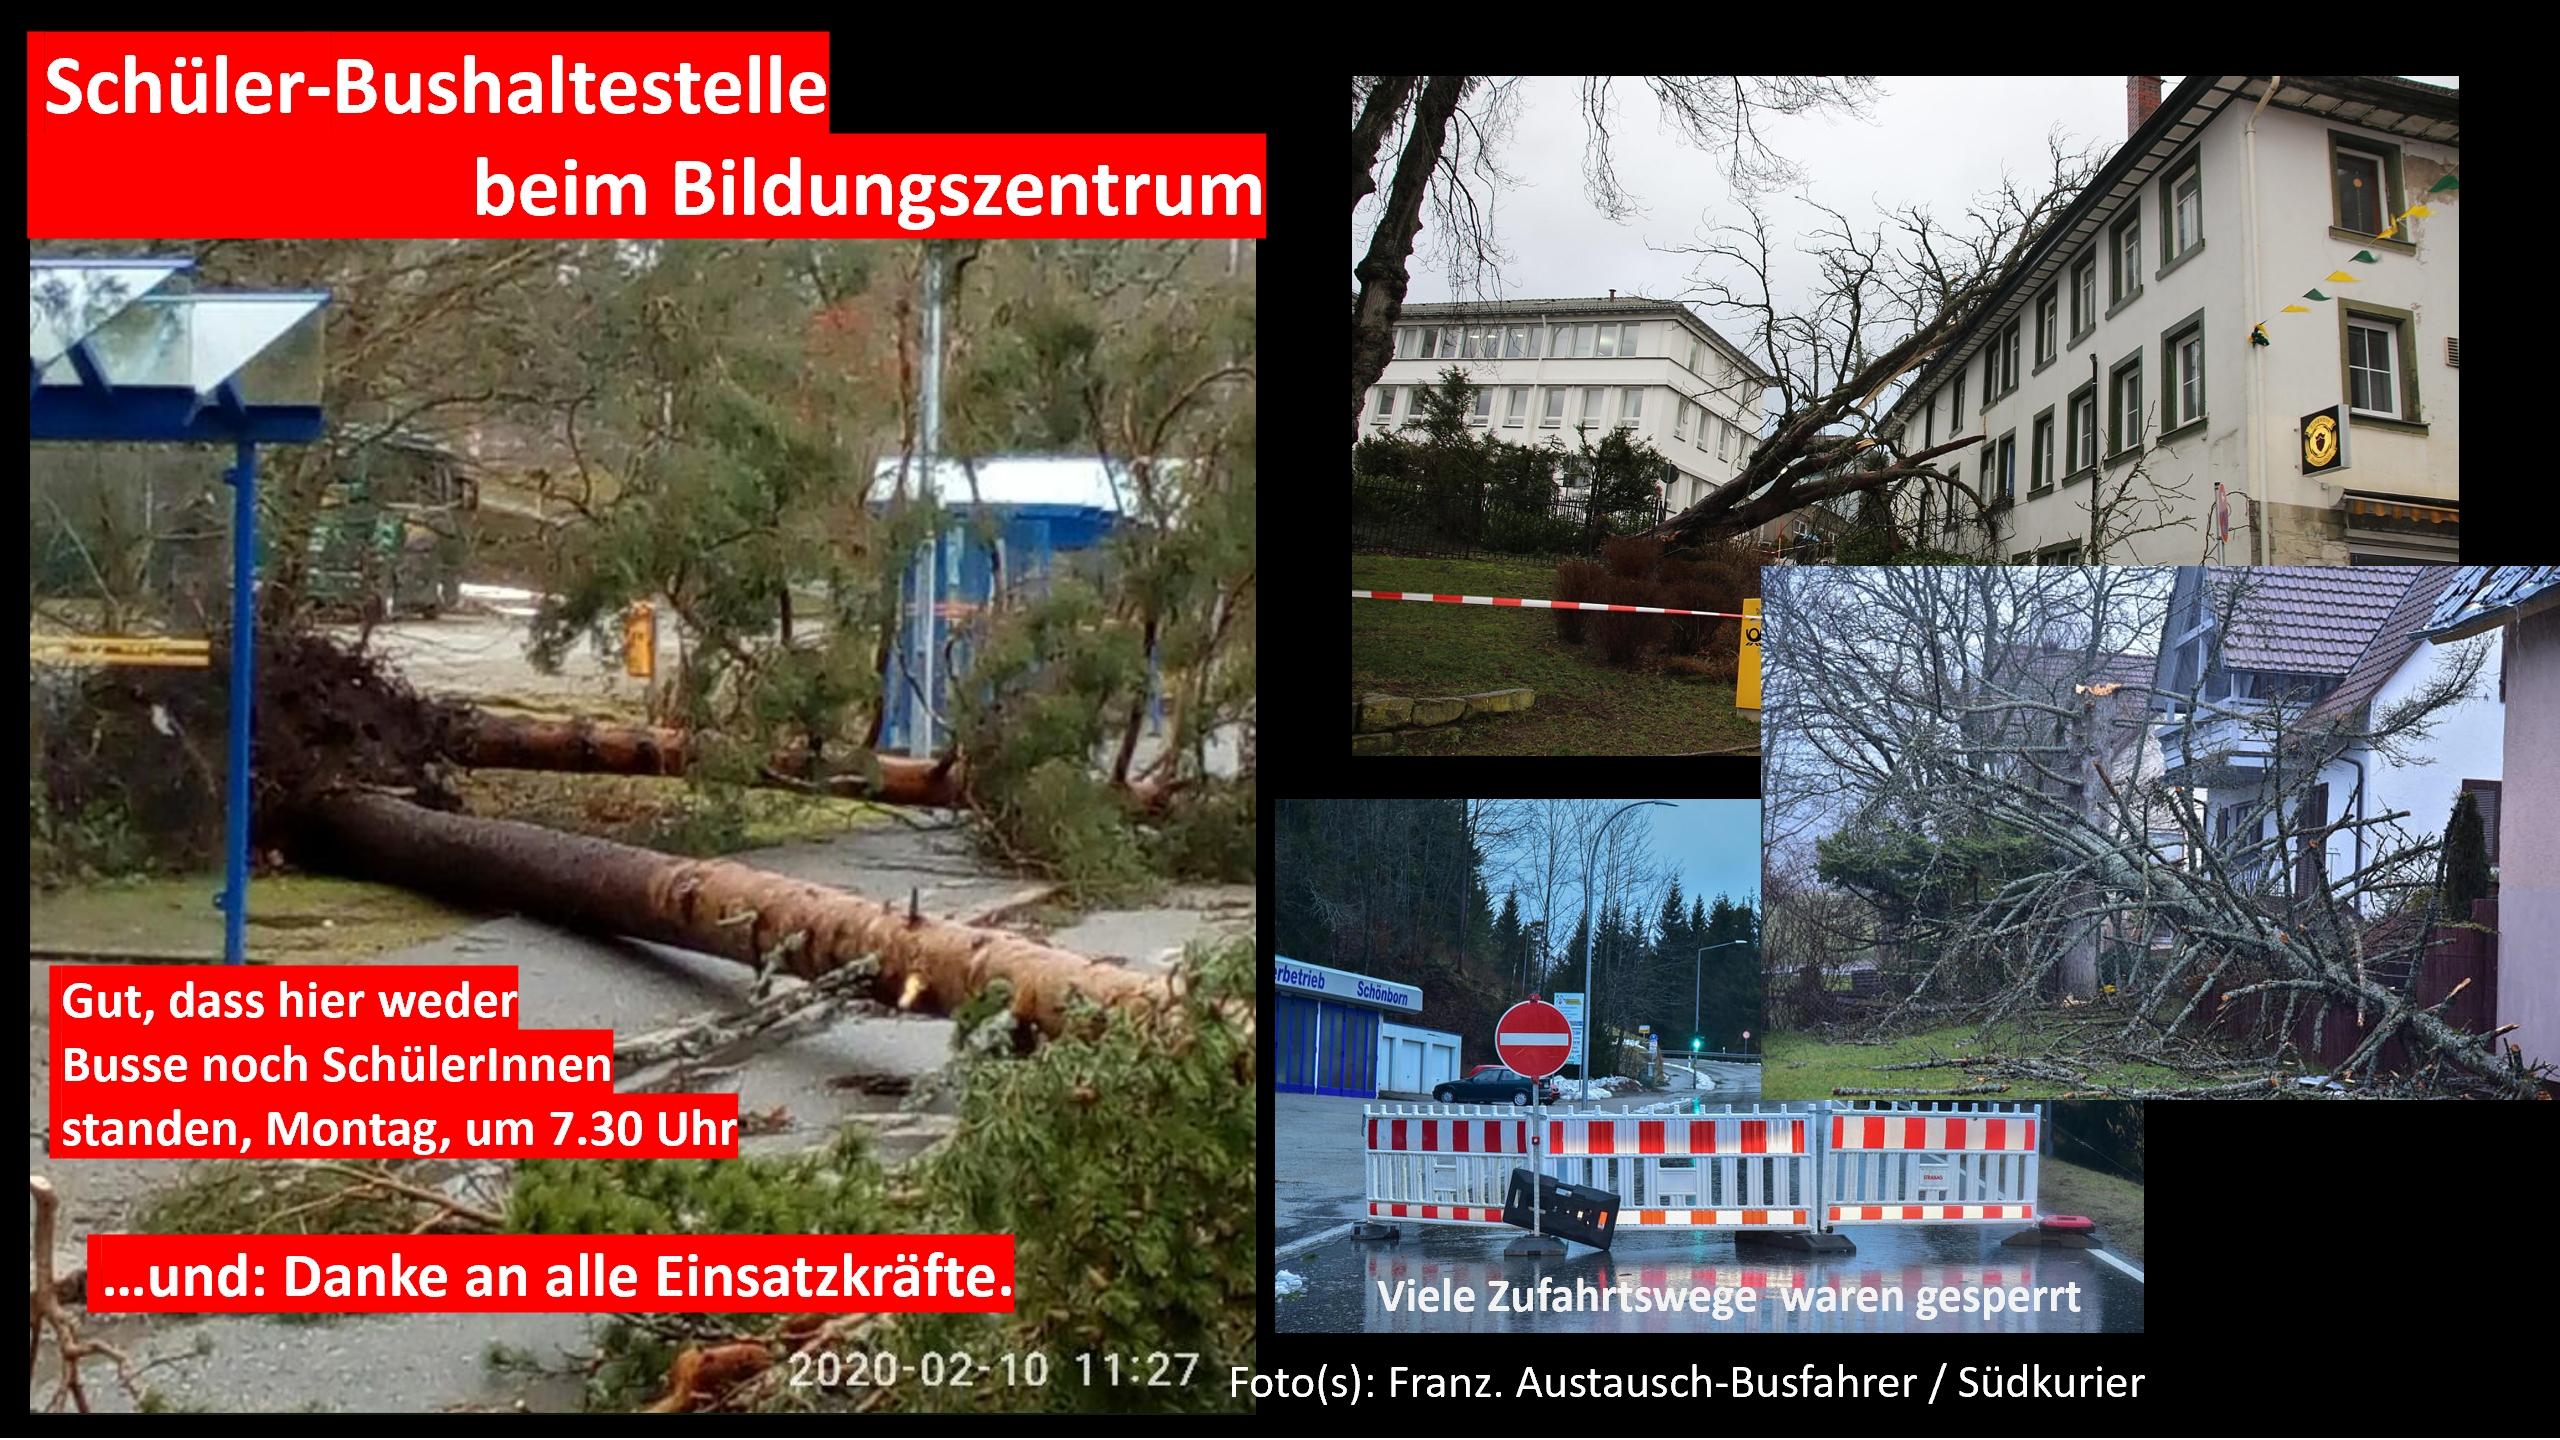 https://tsg-stgeorgen.de/img/Sturmtief-Sabine.jpg